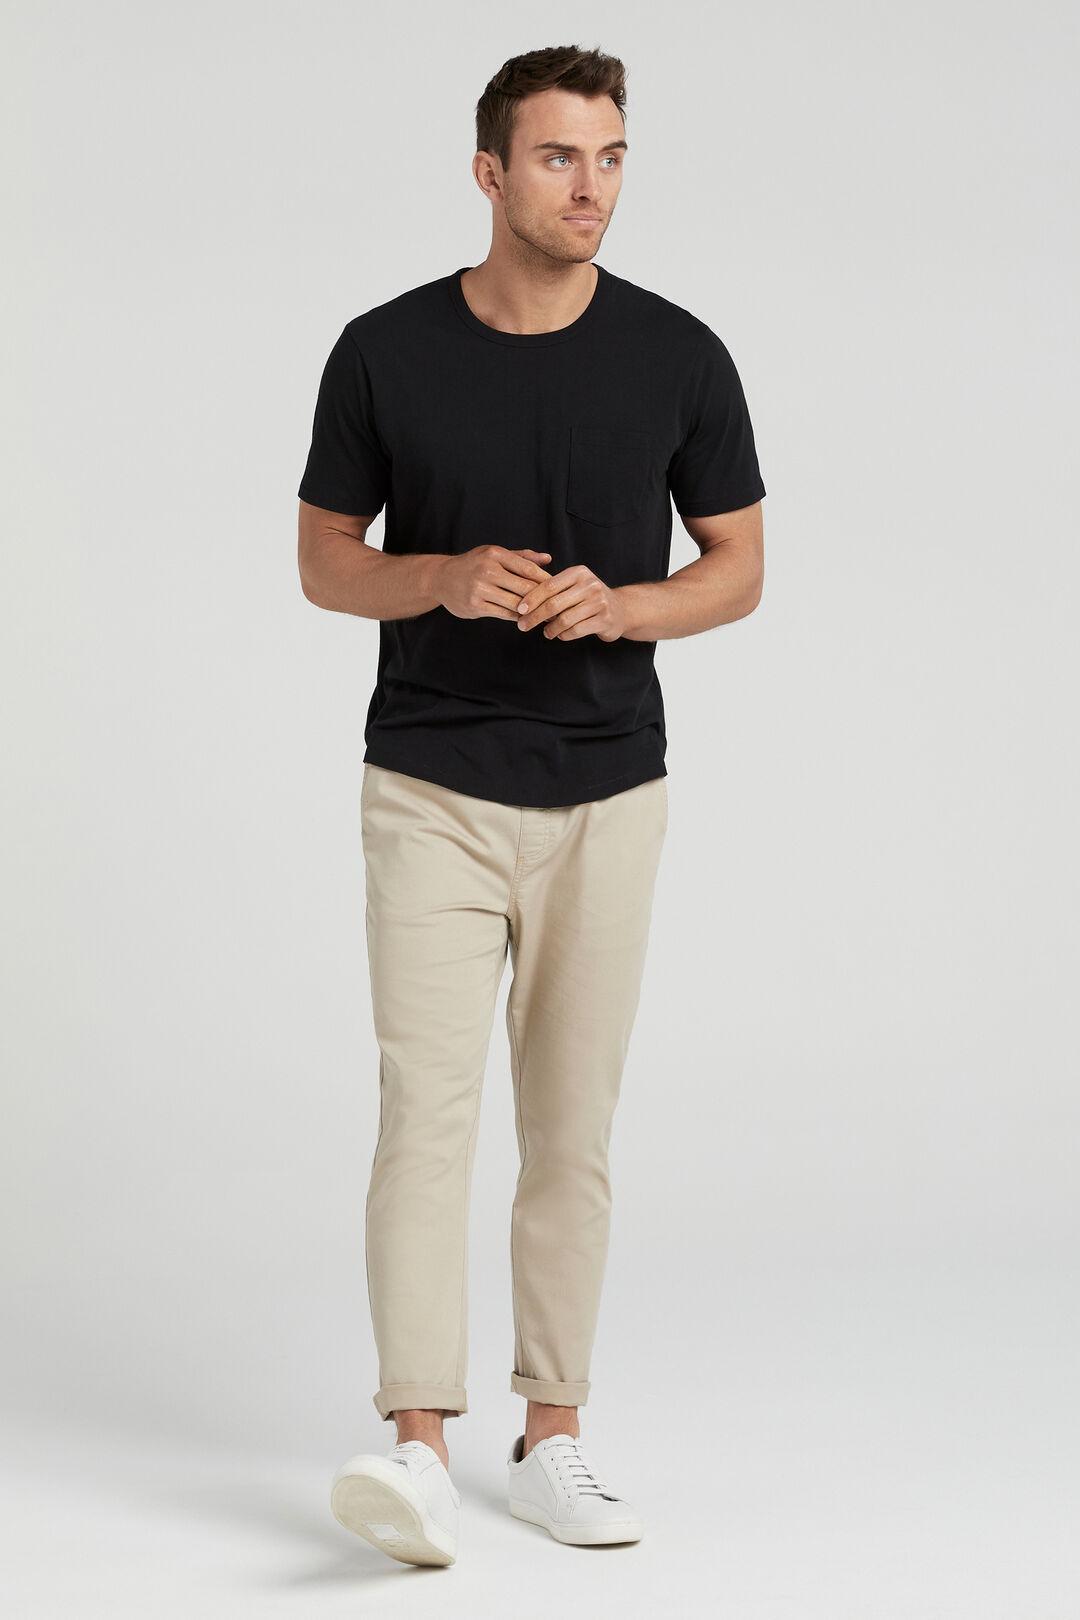 ORGANIC COTTON T-SHIRT  BLACK  hi-res